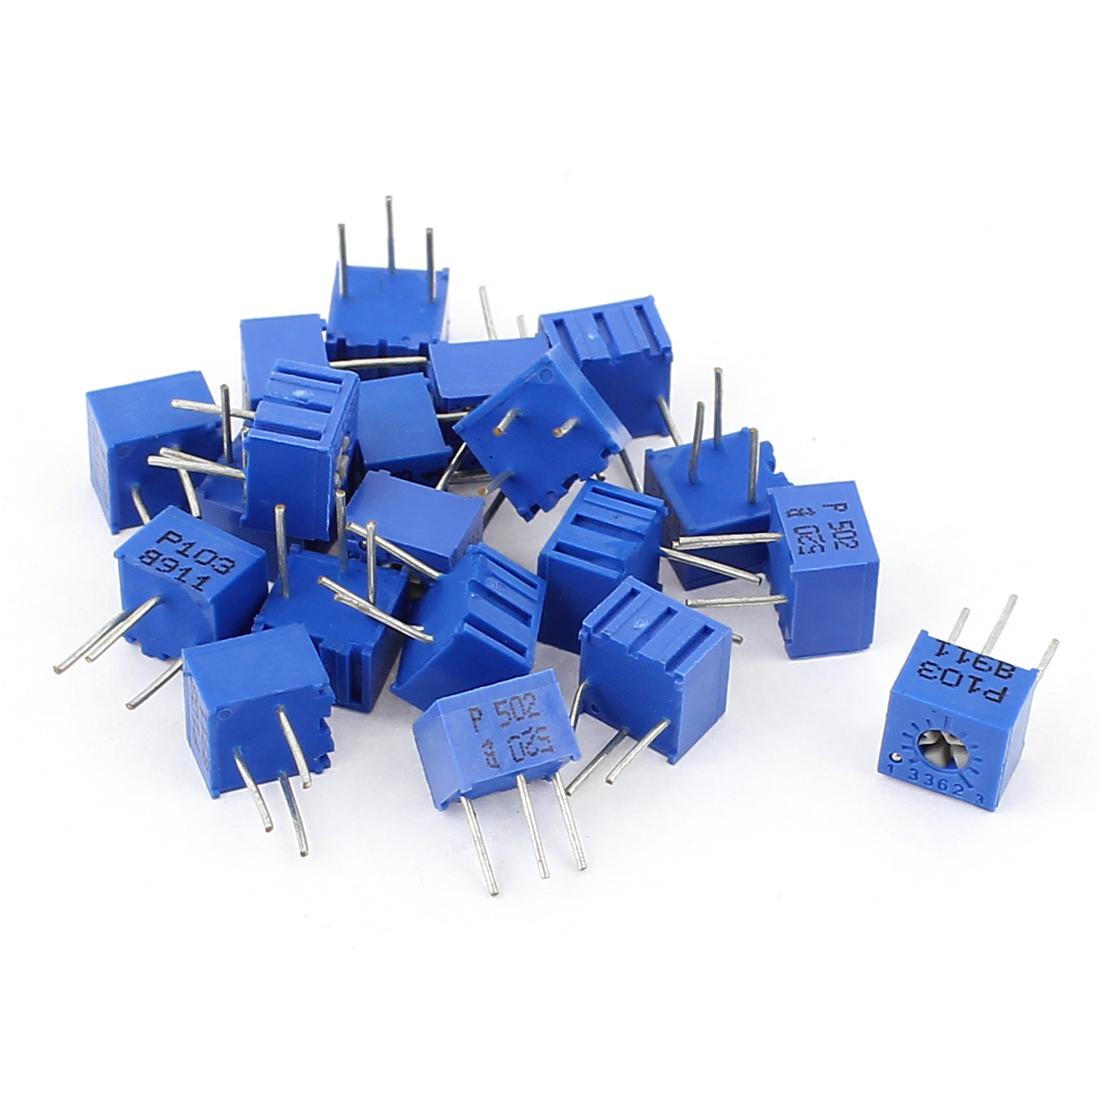 20Pcs Potentiometer Trimmer Variable Resistor 3362P-502 3362P-103